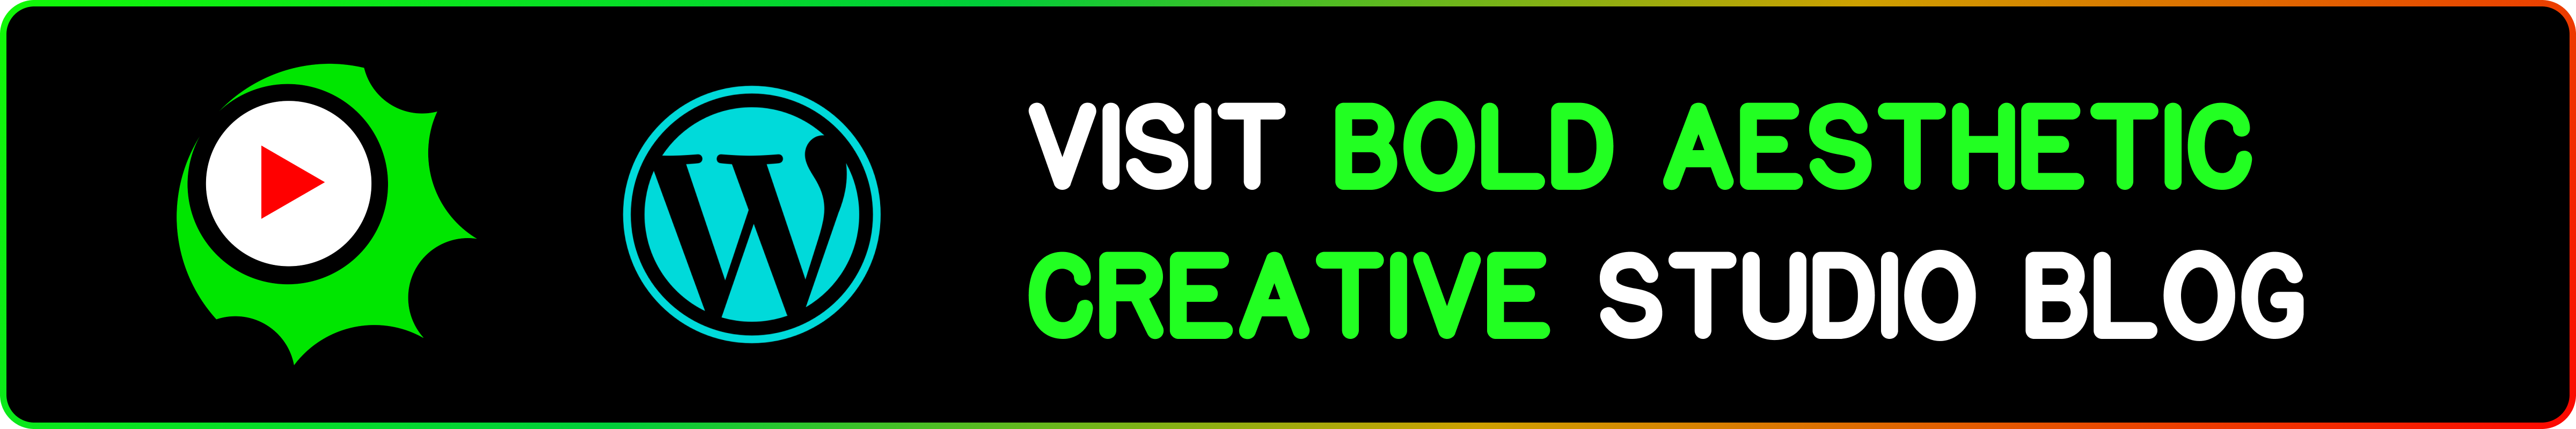 Bold Aesthetic Creative Studio Blog